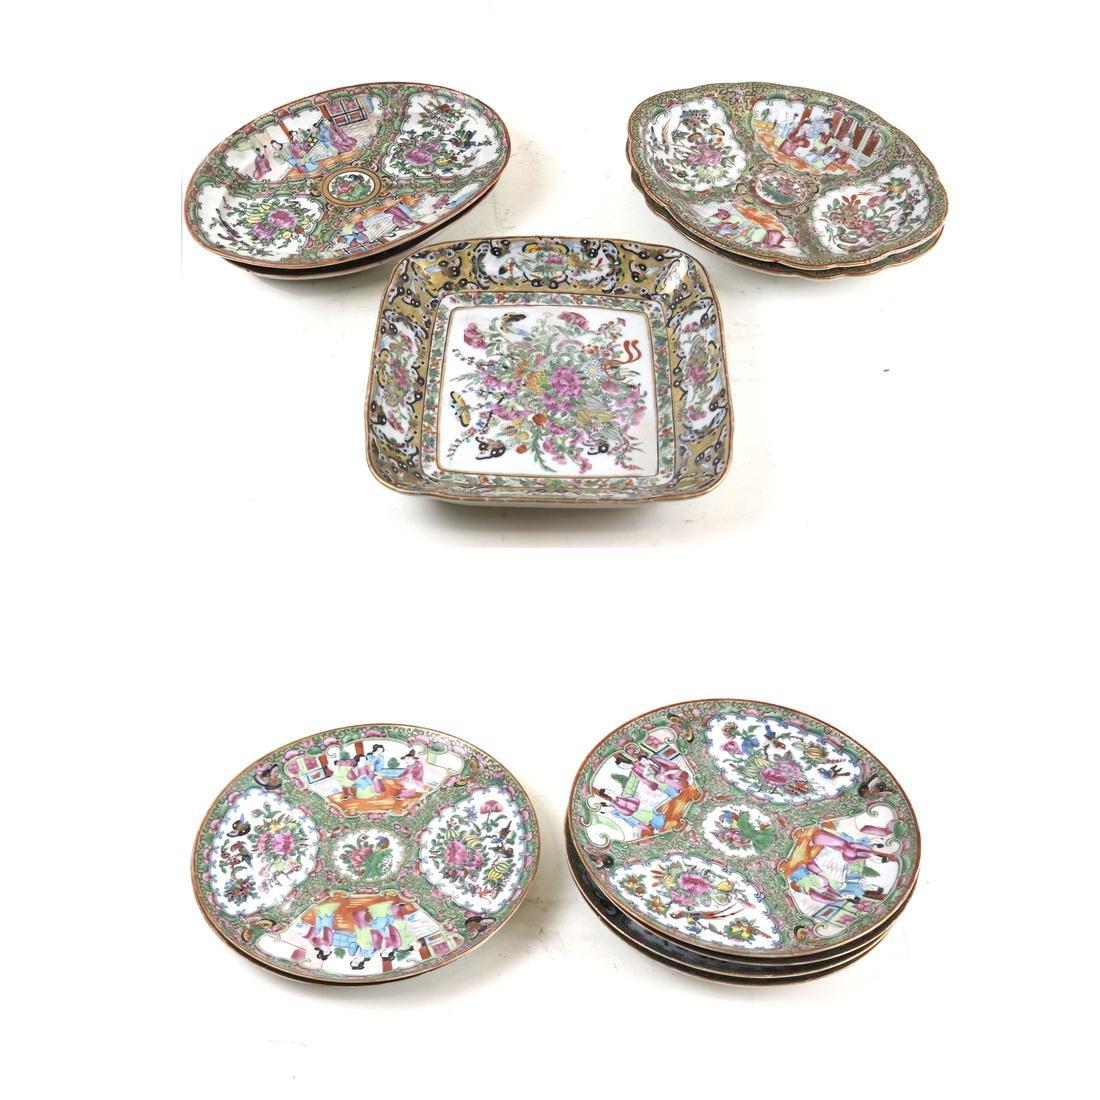 11 Chinese Export Rose Medallion Porcelain Dishes